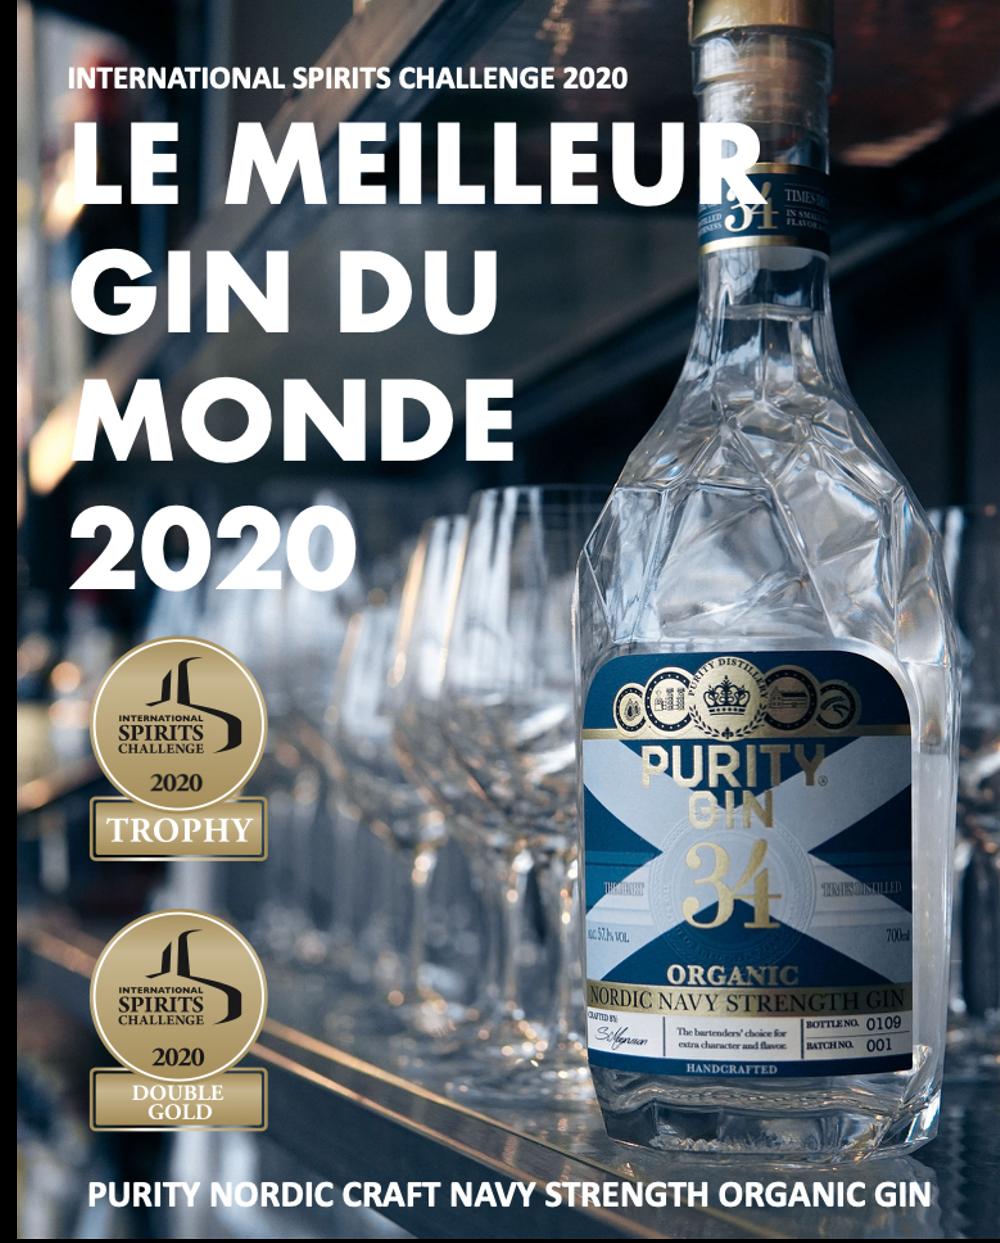 Le meilleur gin du monde - PURITY NORDIC CRAFT NAVY STRENGTH ORGANIC GIN